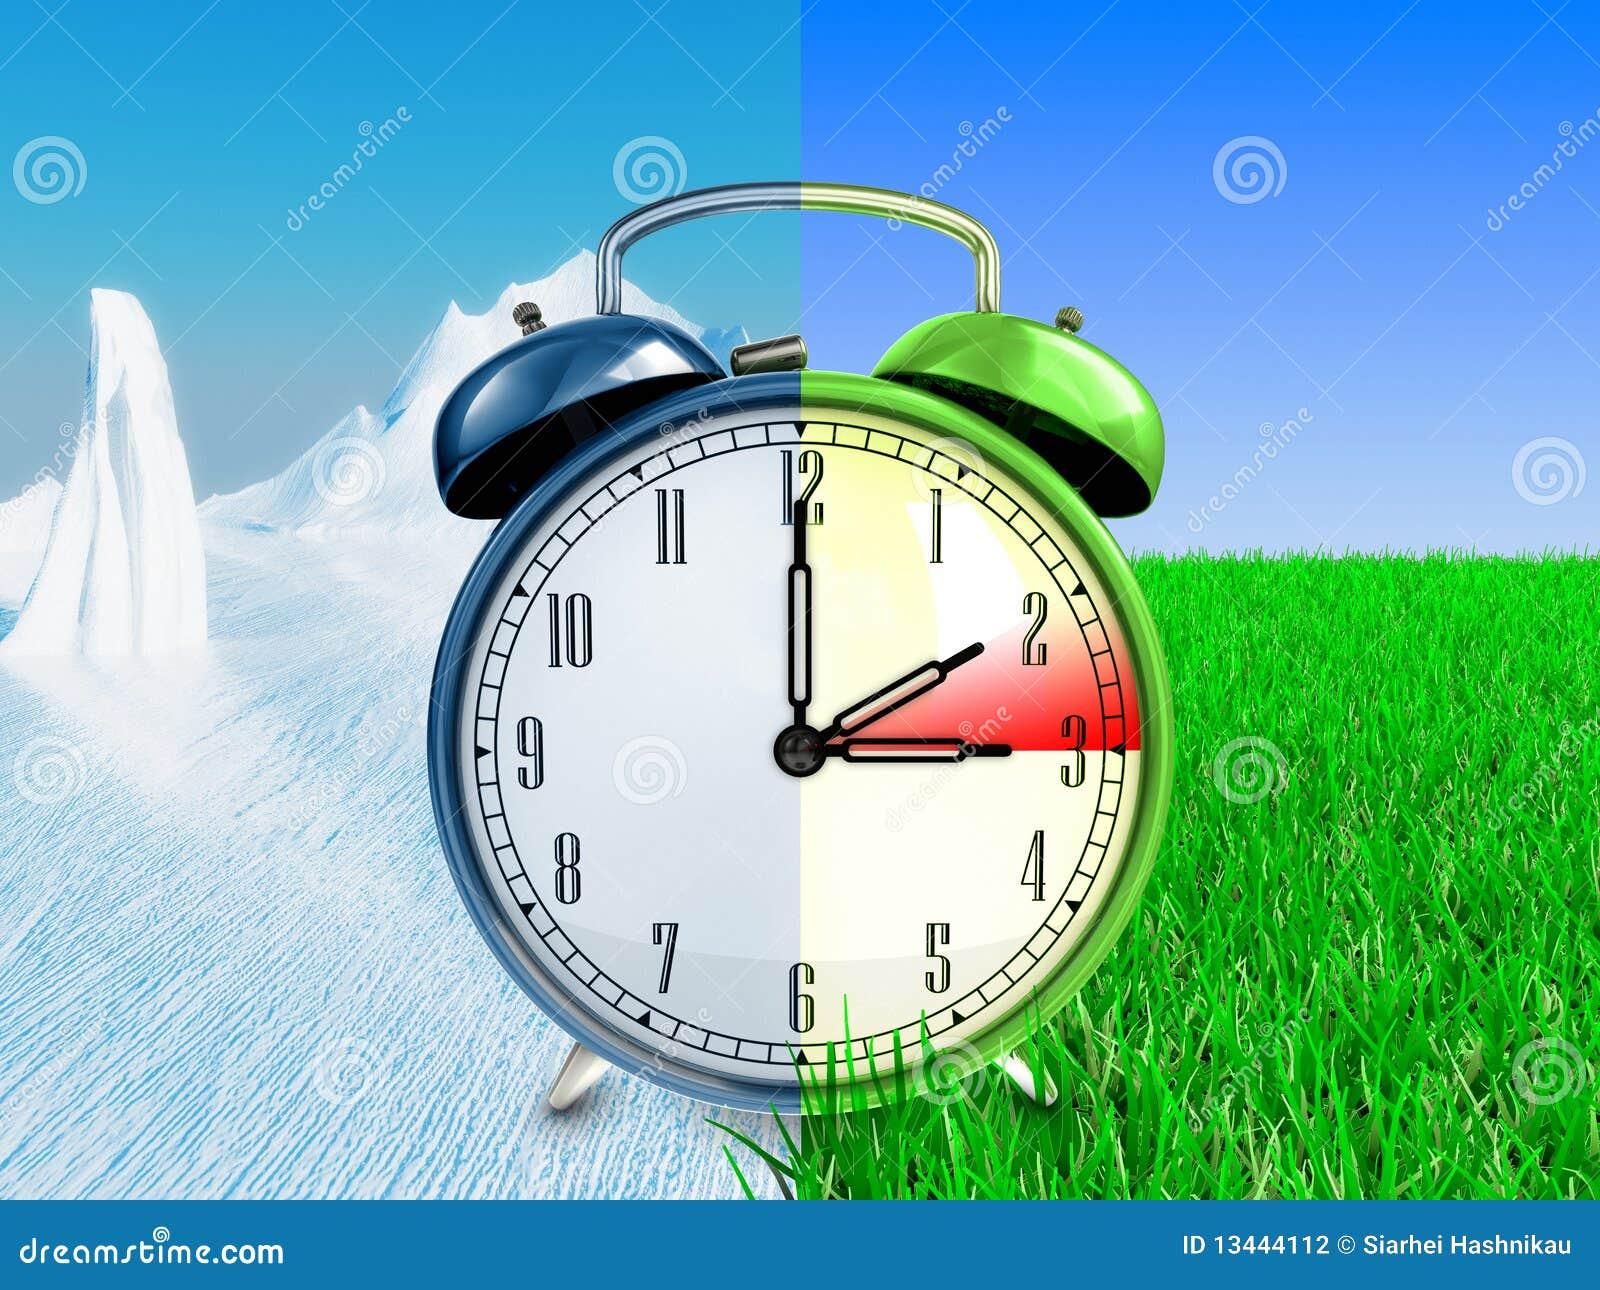 Daylight Saving Time Concept Stock Photography ...